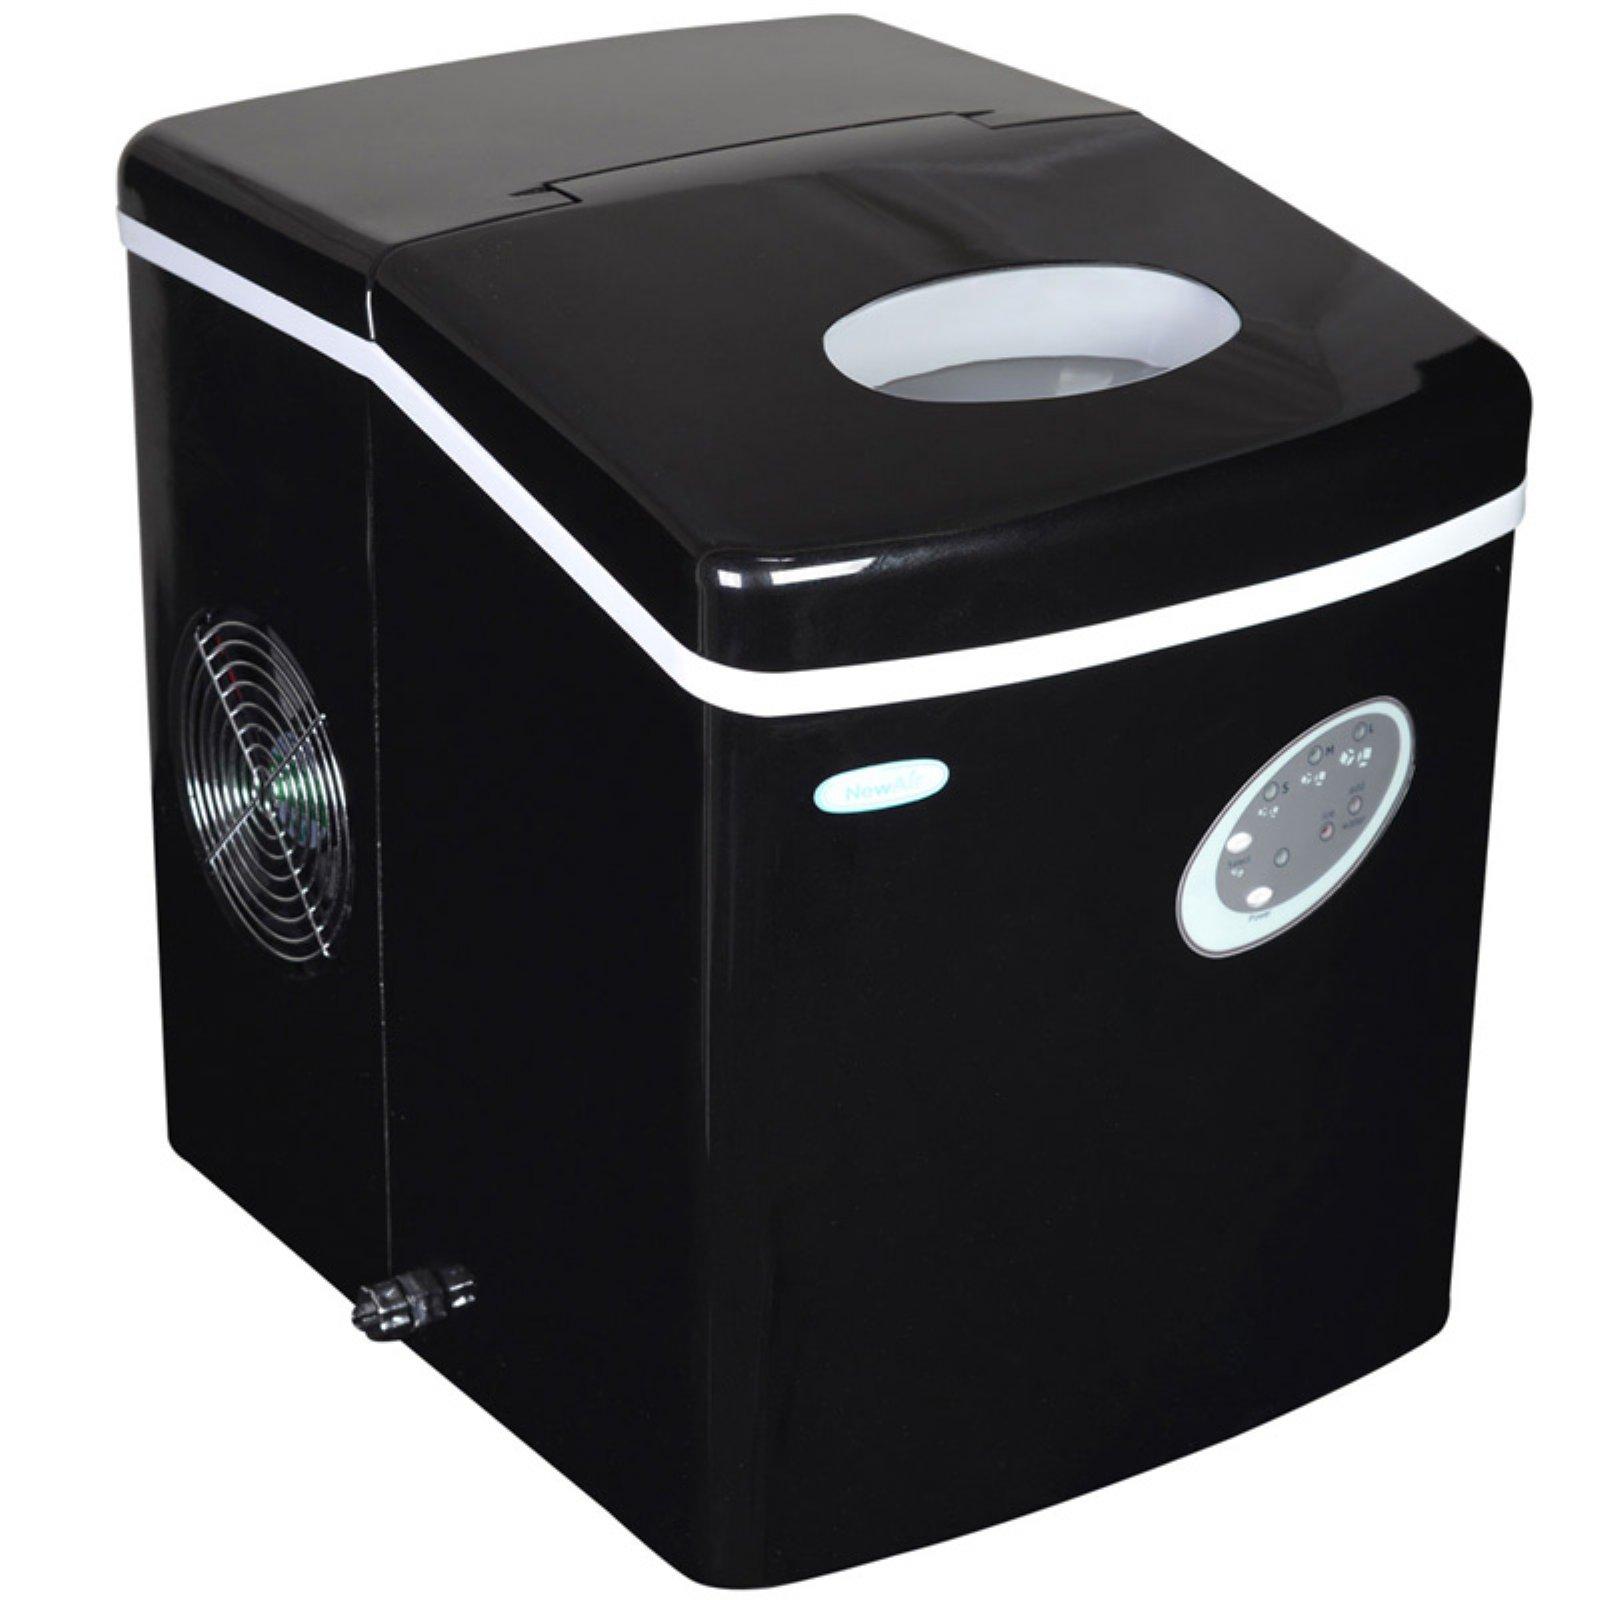 Newair Ai 100bk Portable Ice Maker Portable Ice Maker Ice Maker